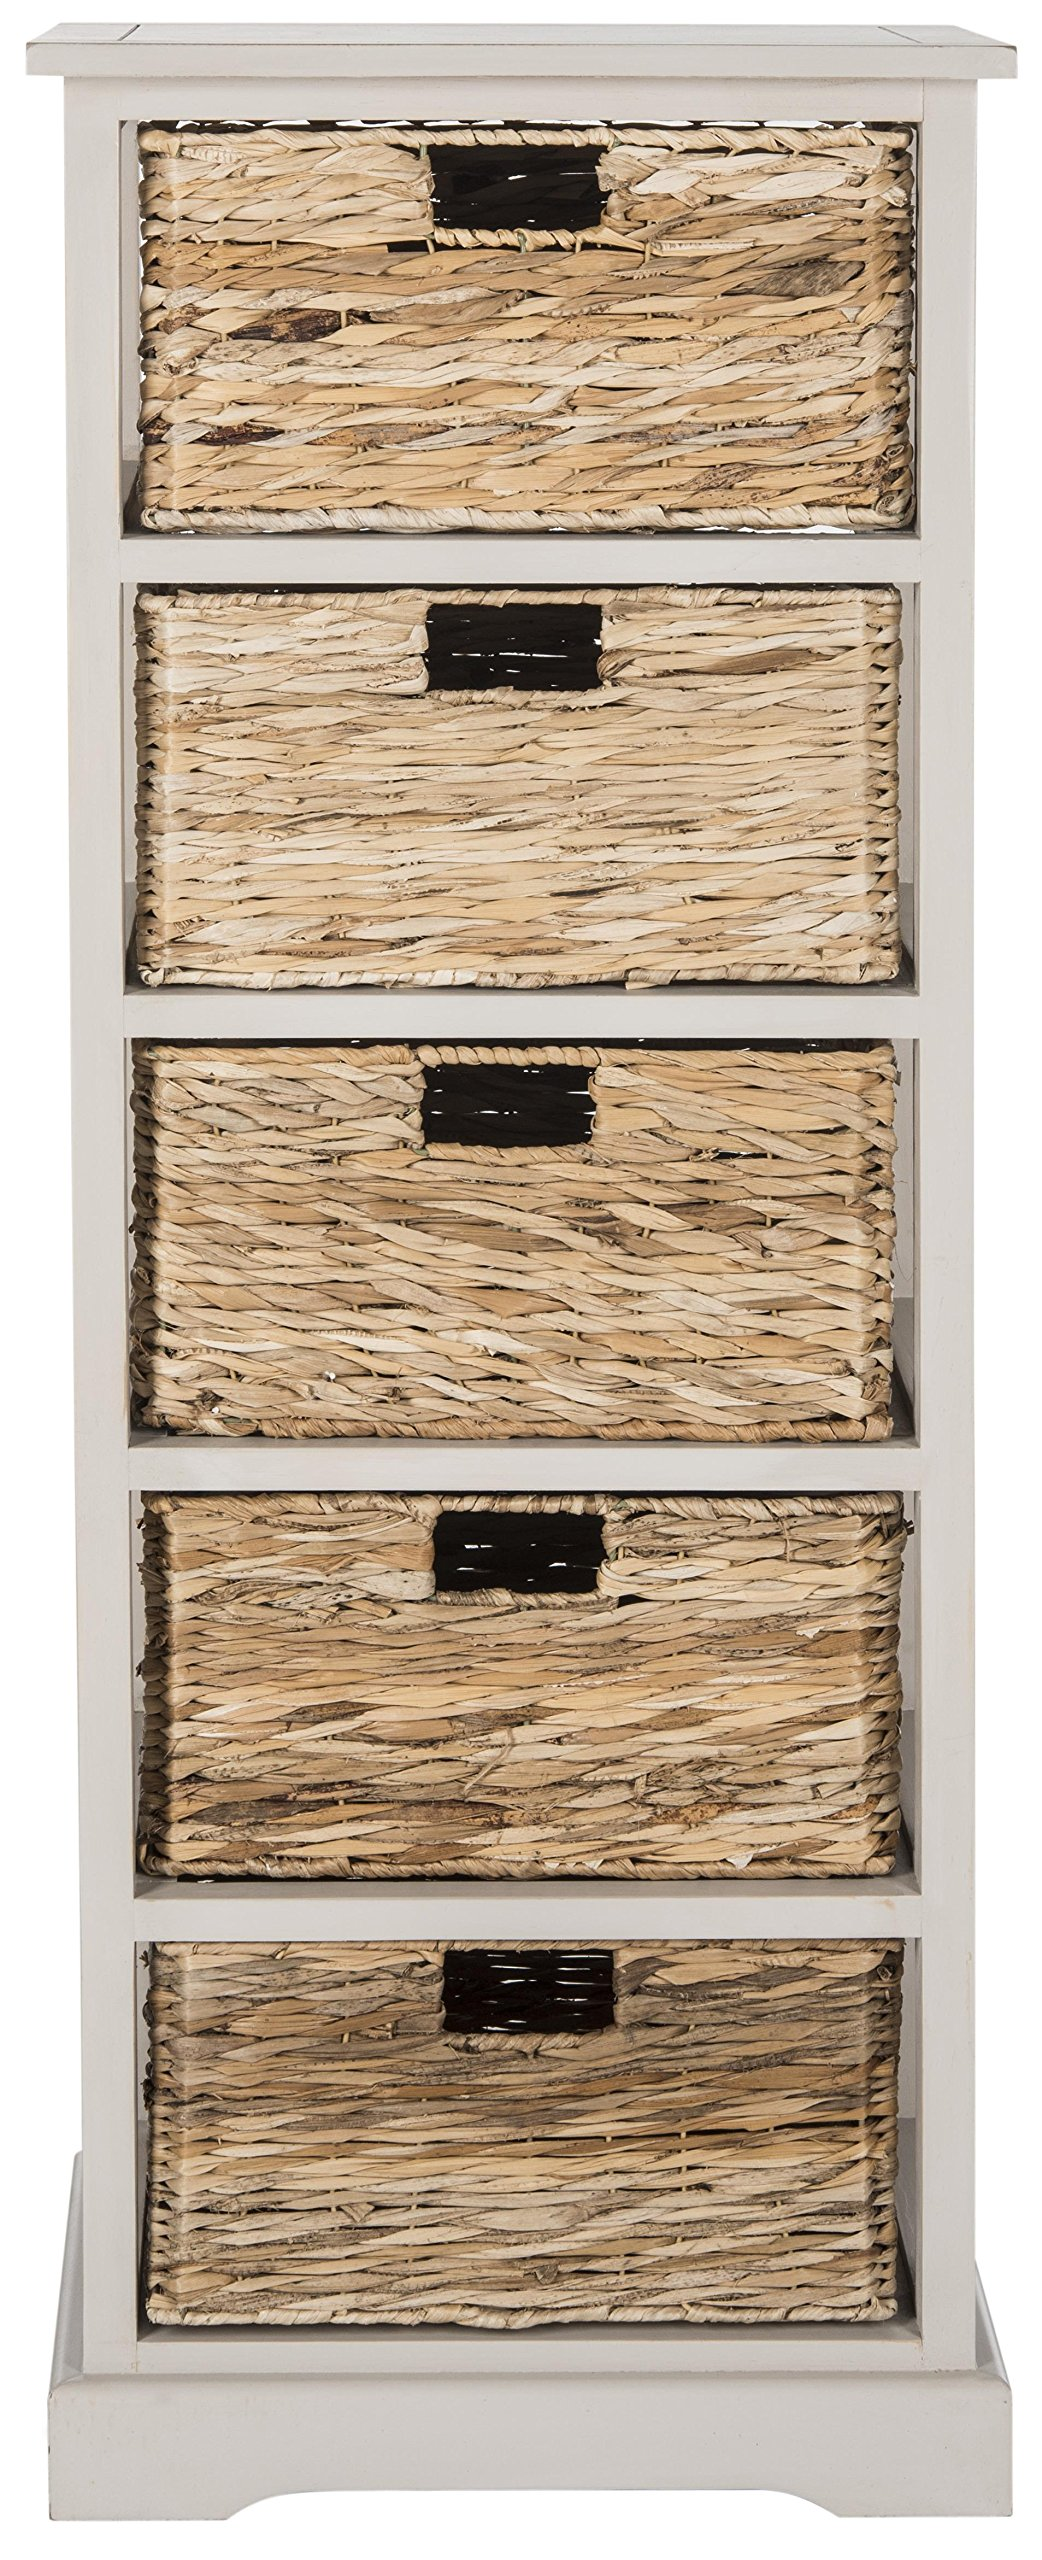 Safavieh American Homes Collection Vedette Vintage Grey 5 Wicker Basket Storage Tower